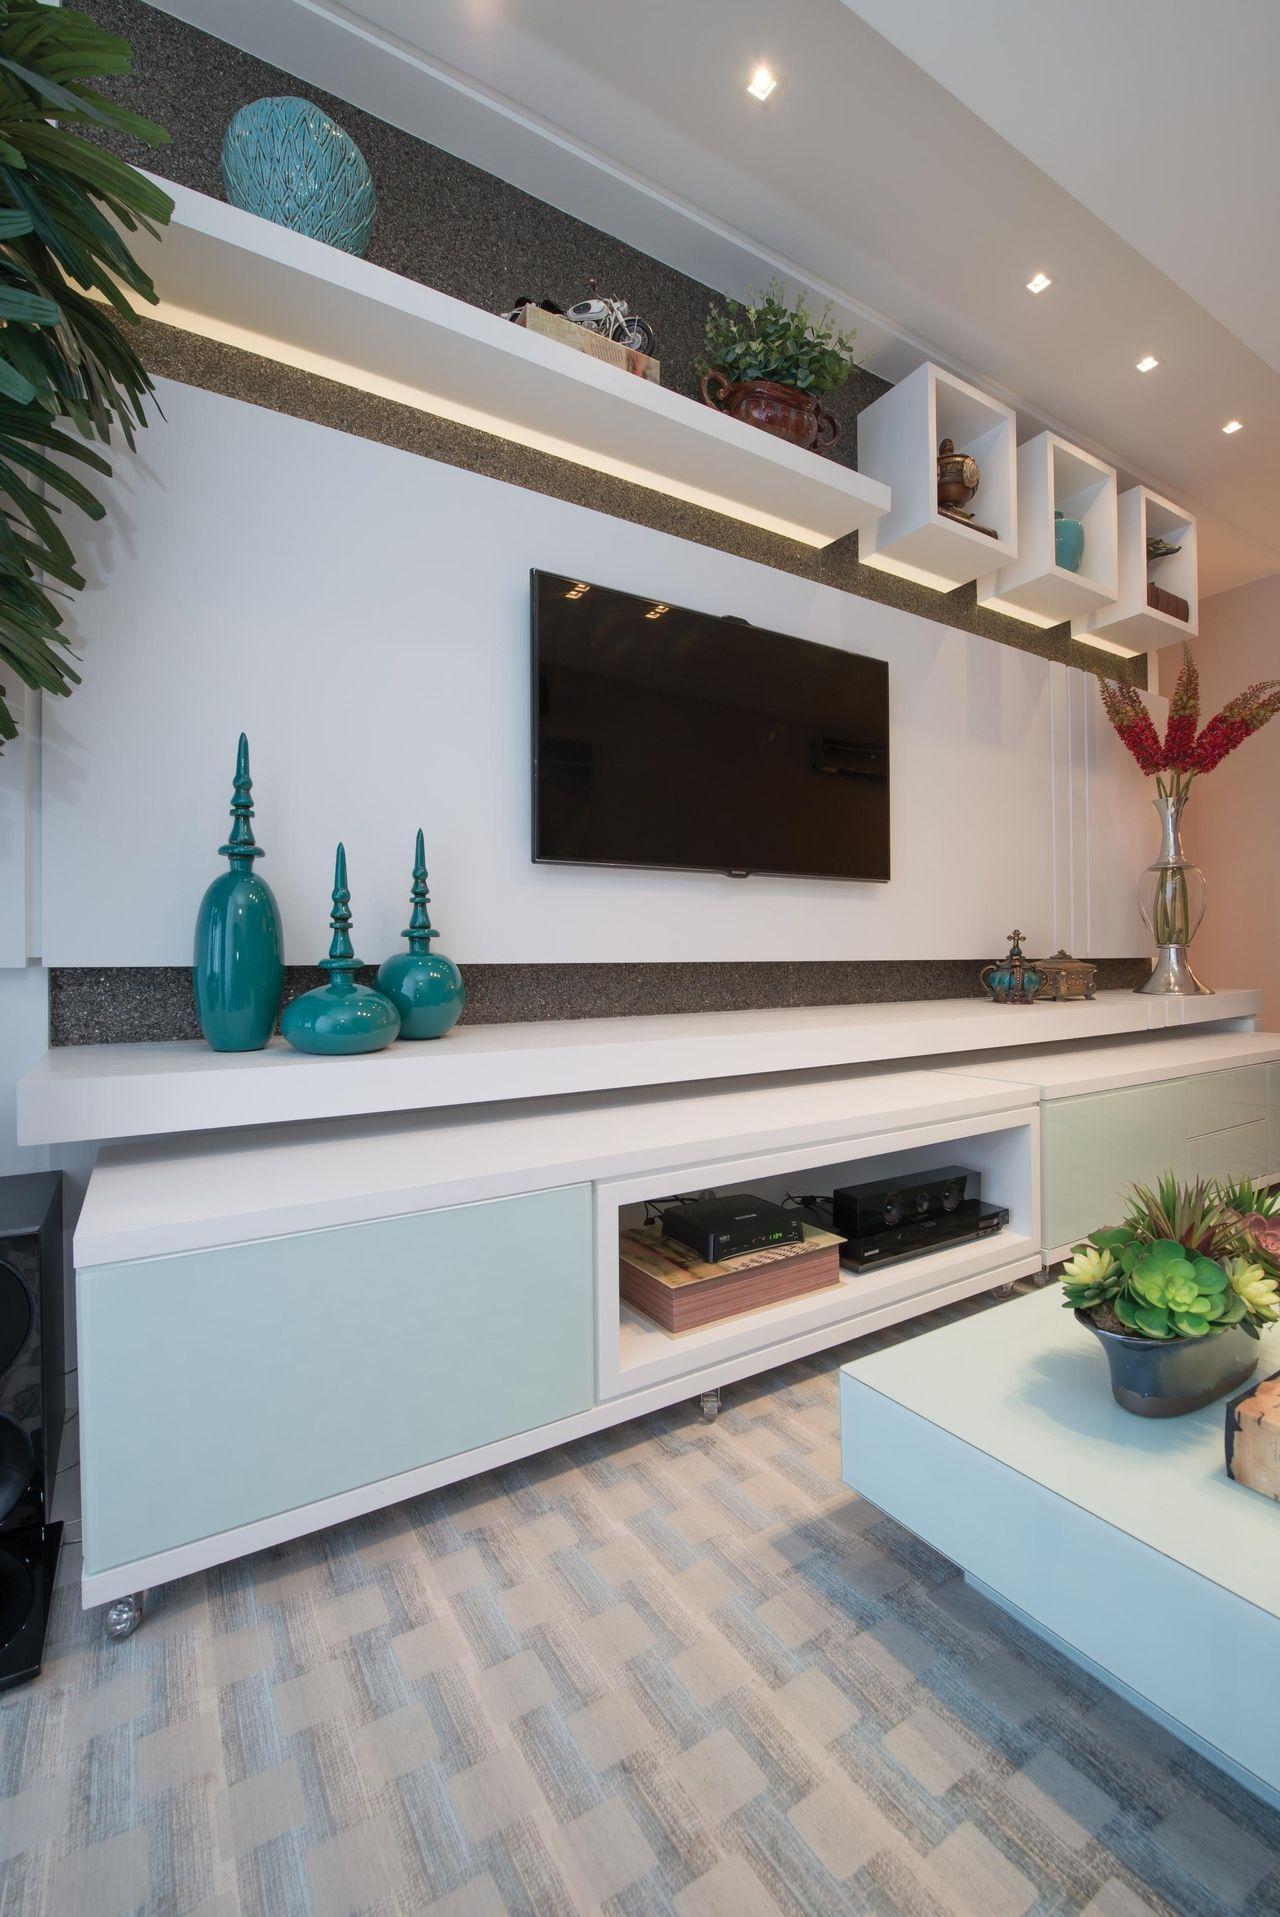 Sala De Estar Com Rack Branco E Vaso Azul De Actual Design 104178  -> Vasos Na Sala De Tv